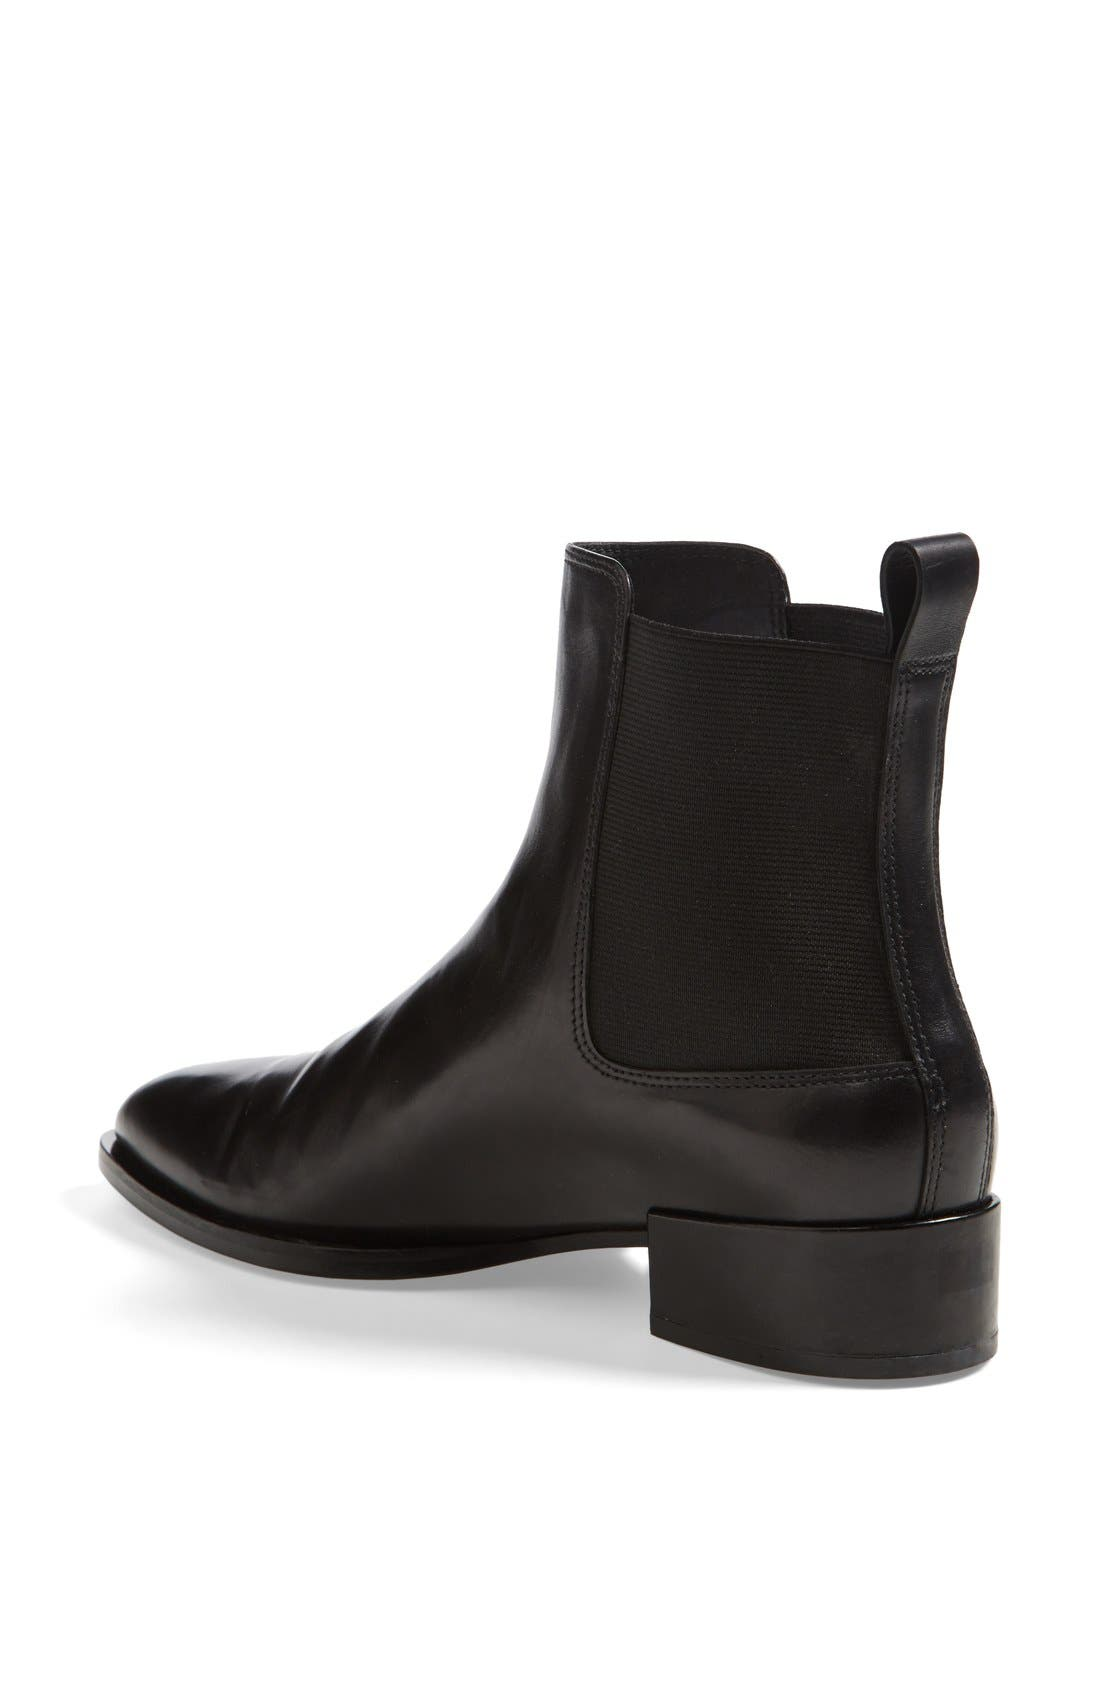 VINCE, 'Yarmon' Almond Toe Calfskin Leather Chelsea Boot, Alternate thumbnail 3, color, 002